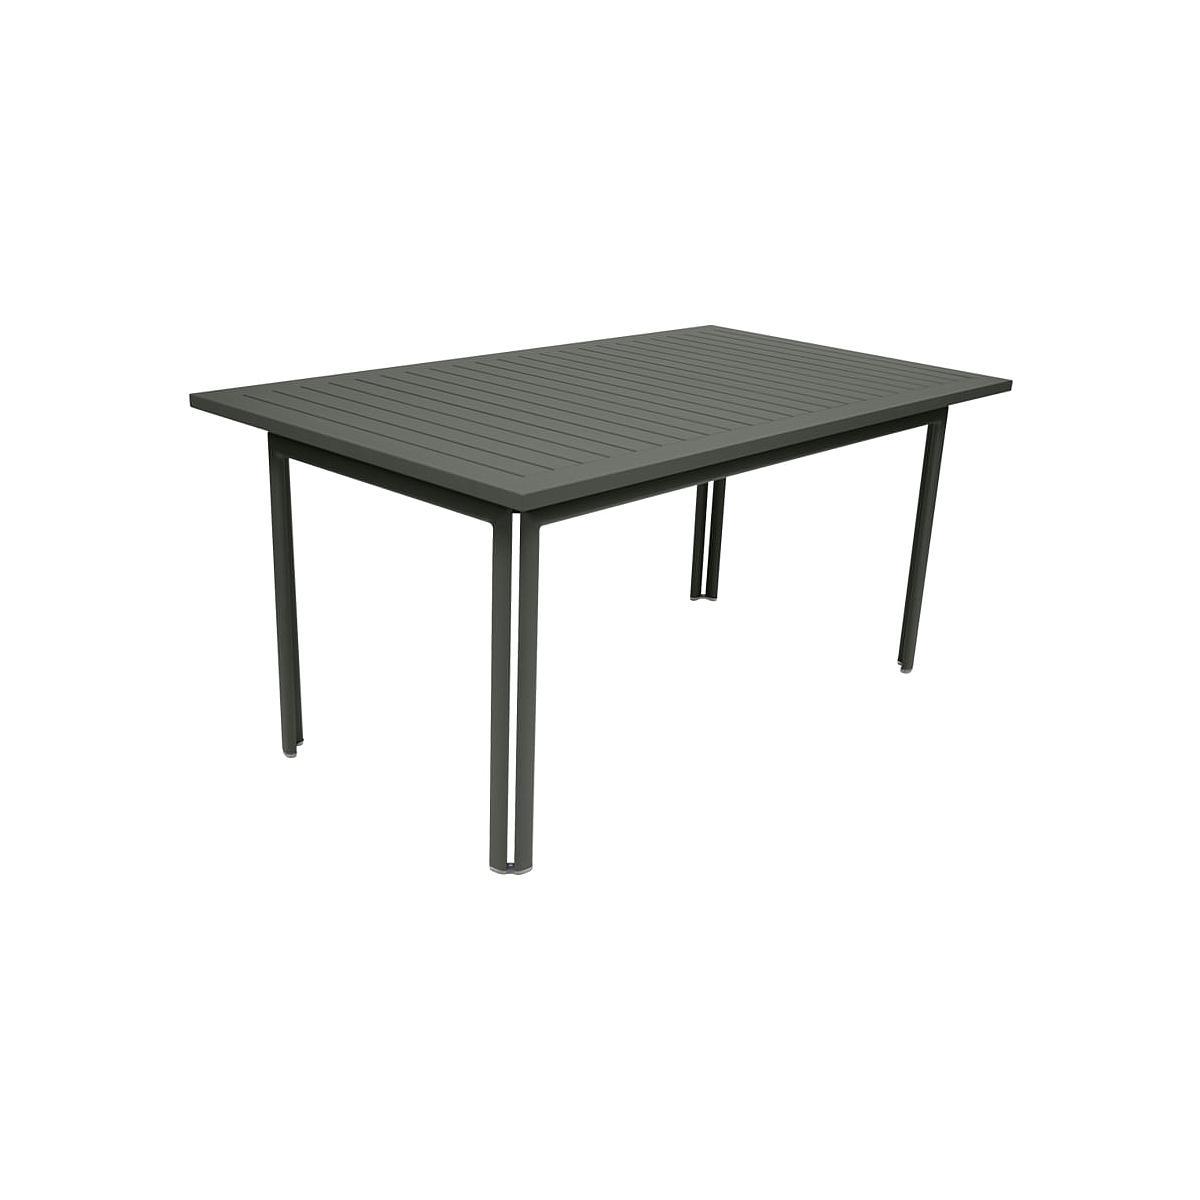 Table de jardin COSTA FERMOB 160x80cm Romarin